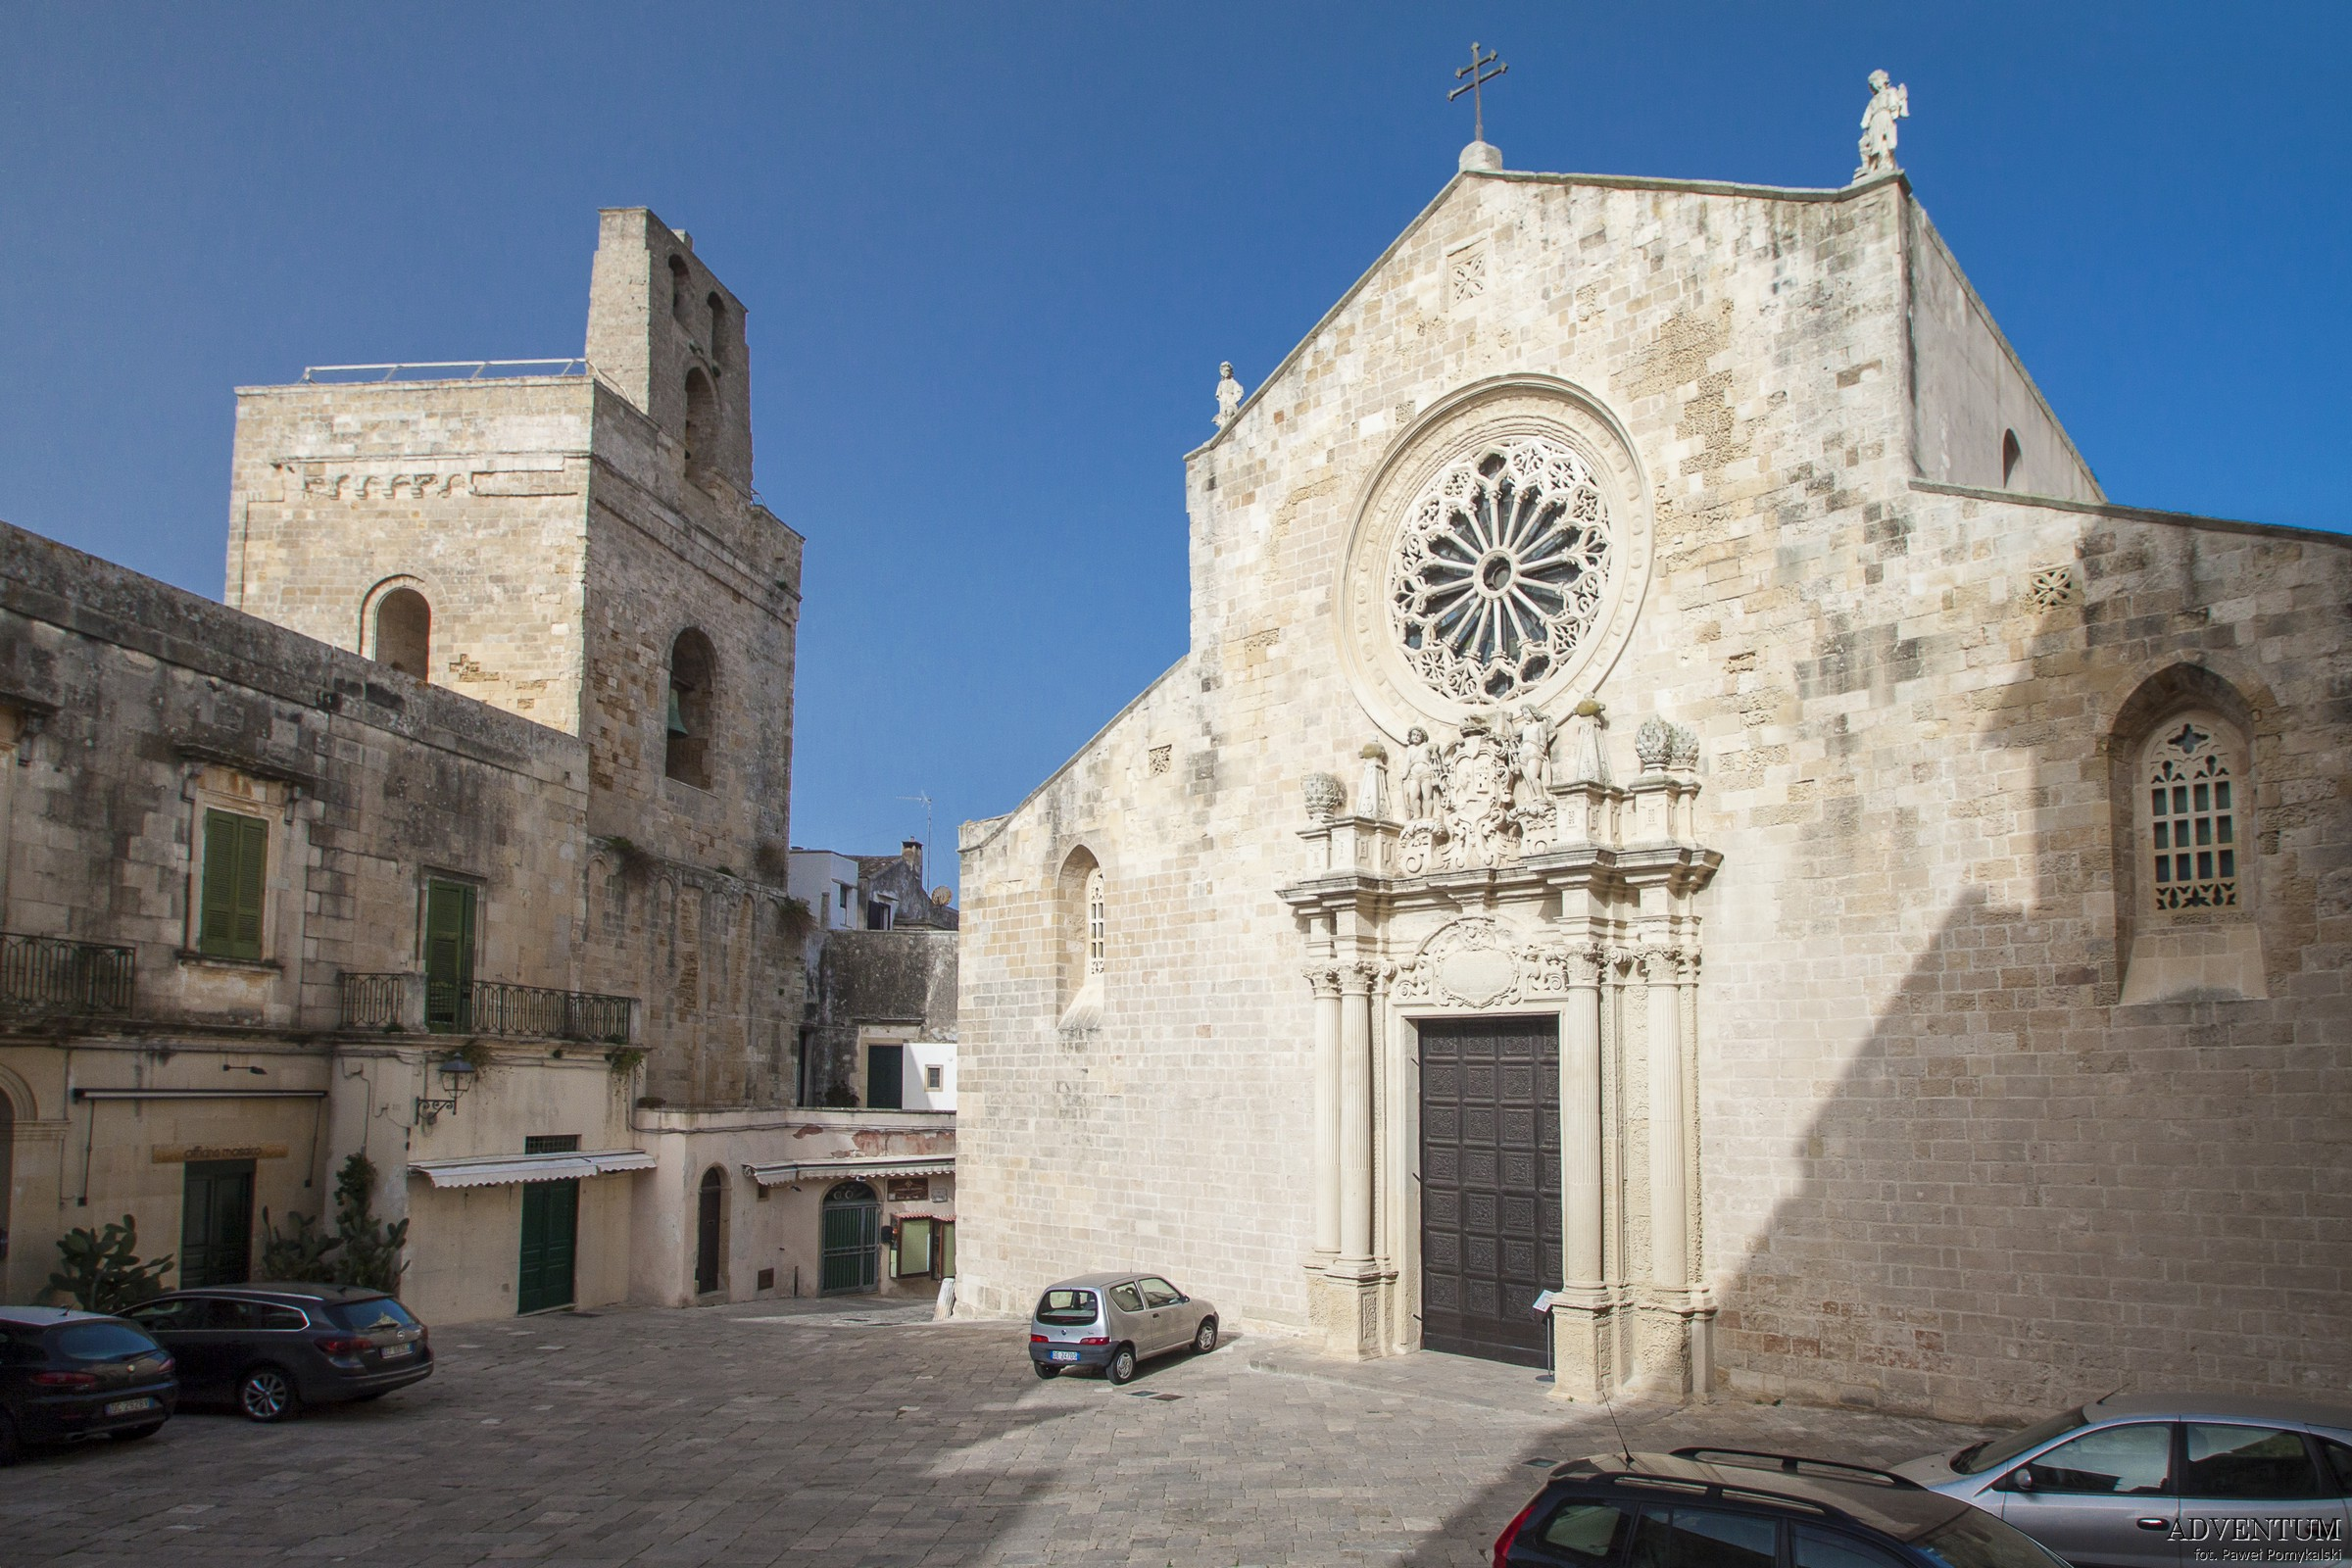 Apulia Puglia Włochy Italy Bari Przewodnik Atrakcje Bitonto Martina Franca Otranto Altamura